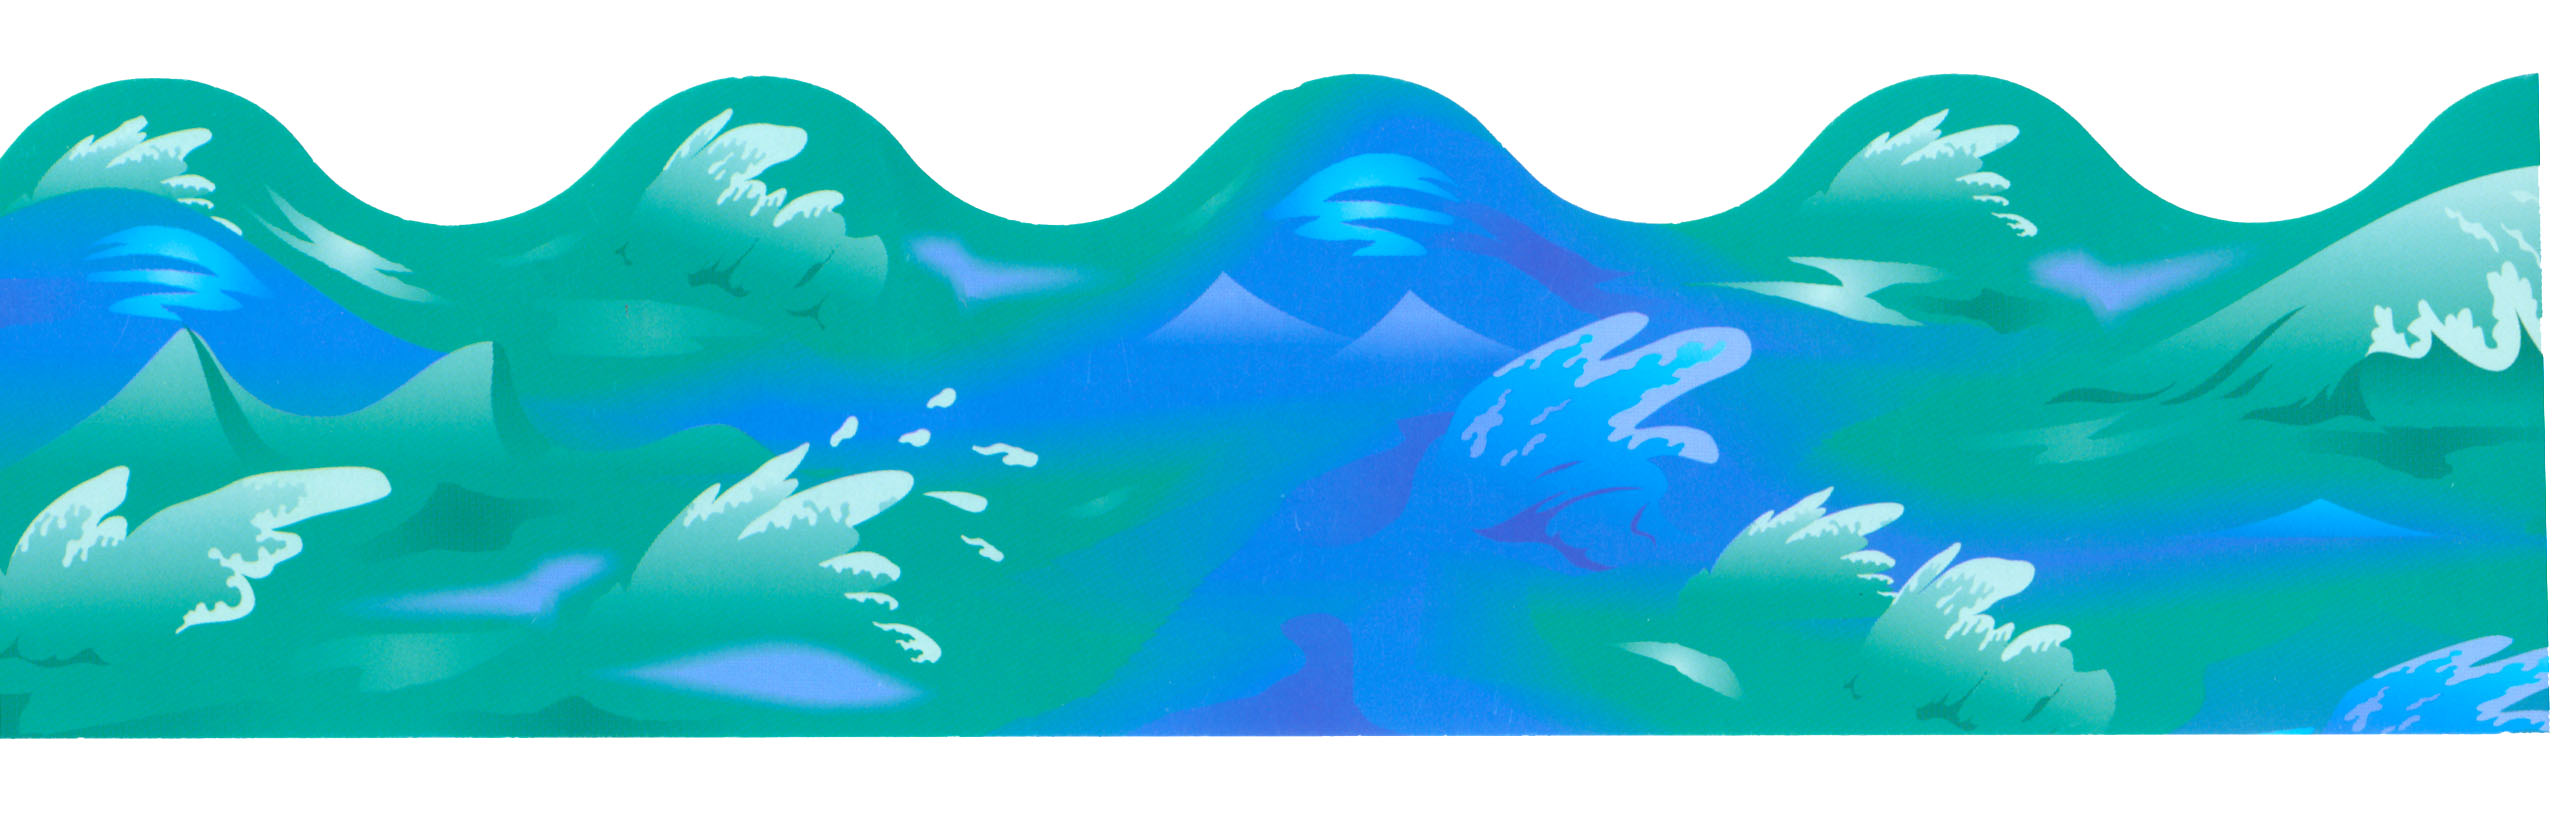 Ocean Waves Border Clipart Best-Ocean Waves Border Clipart Best-2